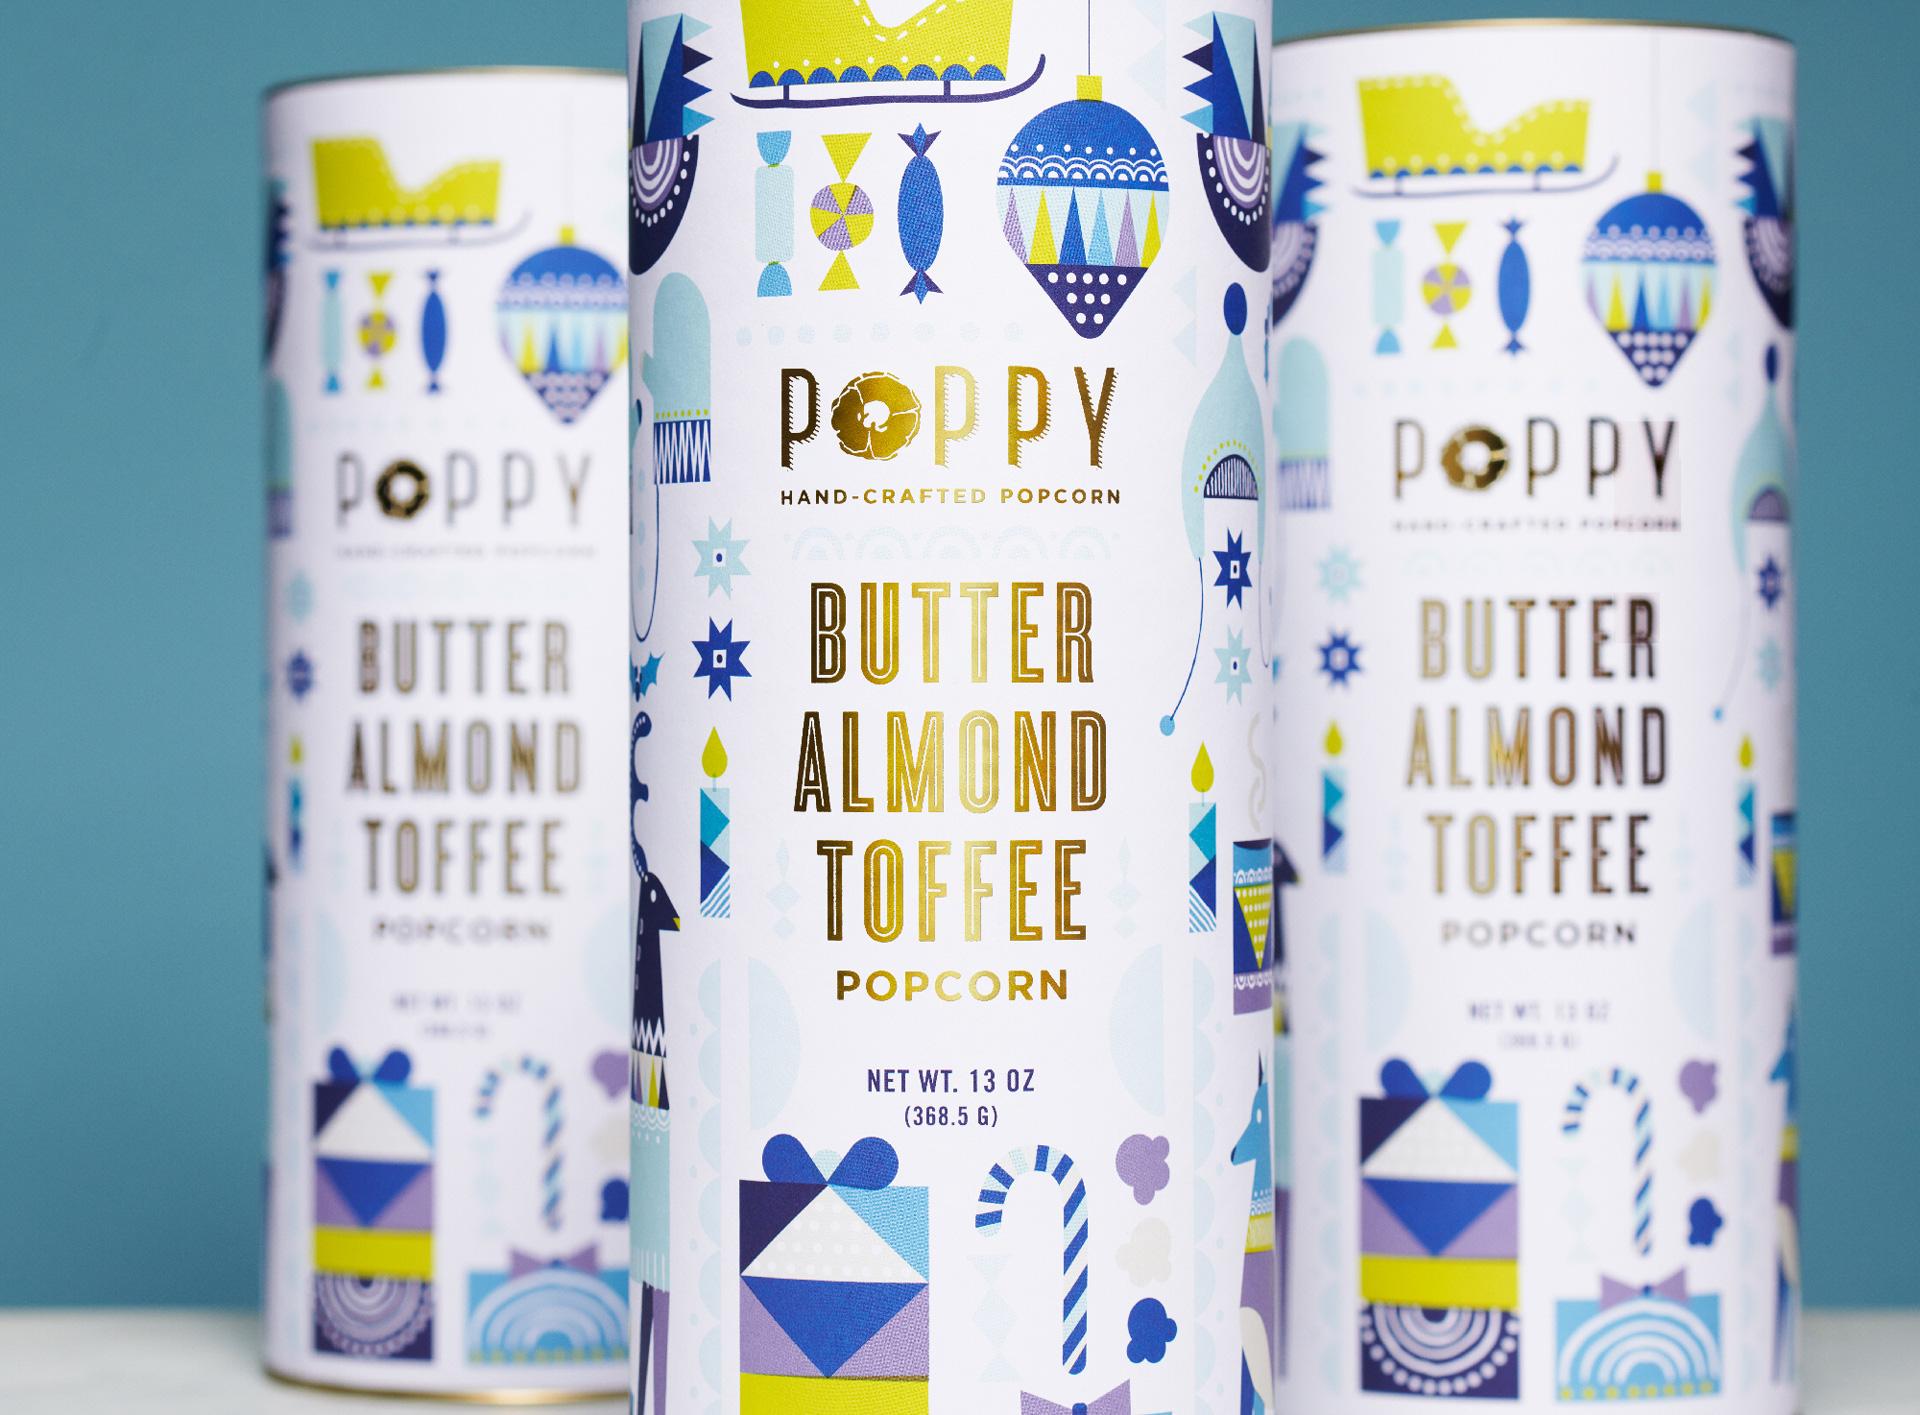 Atlas Branding Create Gourmet Popcorn Holiday Packaging Design